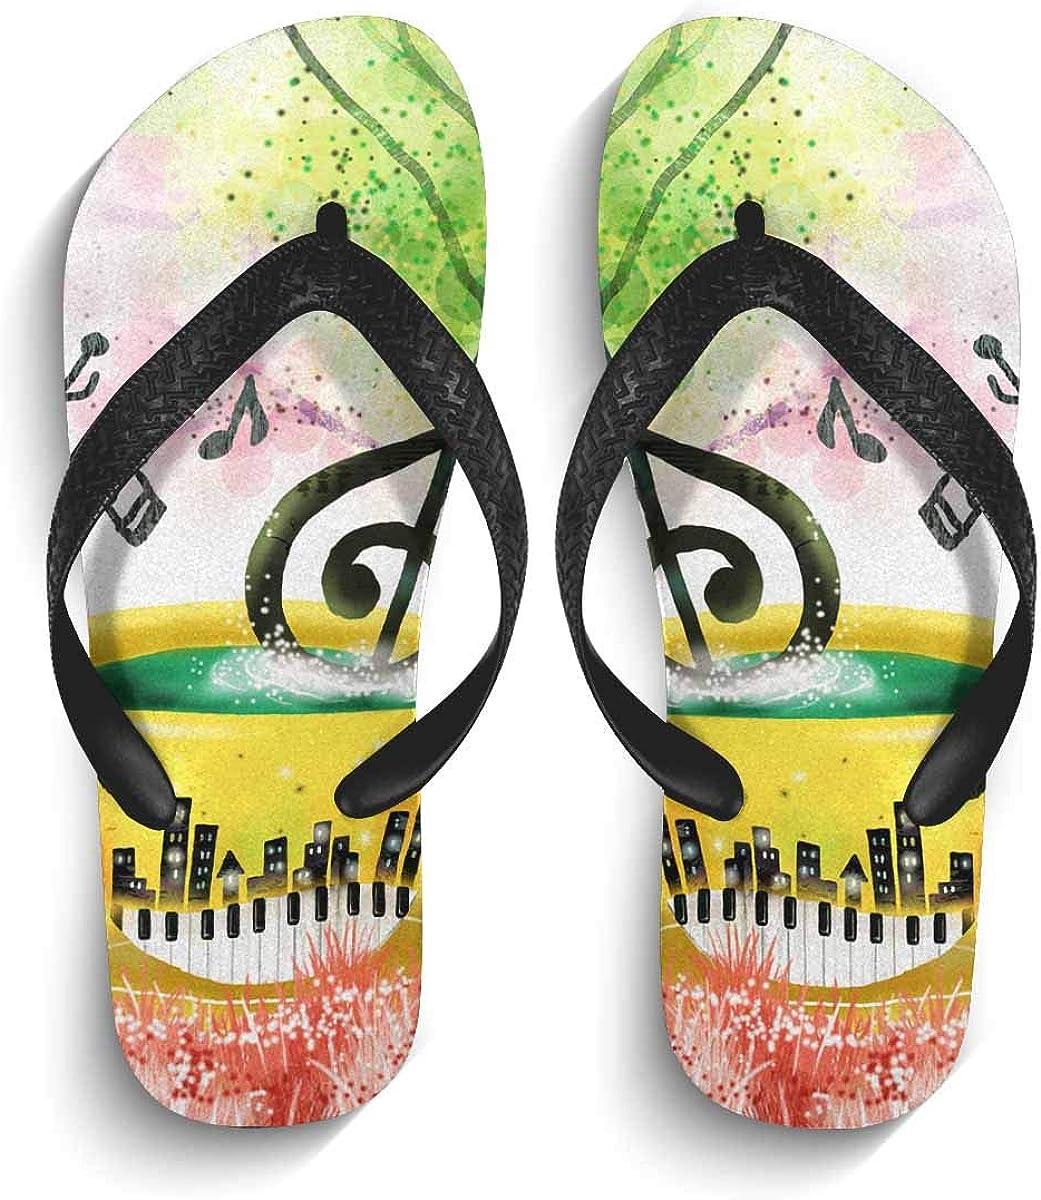 INTERESTPRINT Men's Non-Slip Flip Flop Slippers Monochrome Pattern Beach Thong Sandal